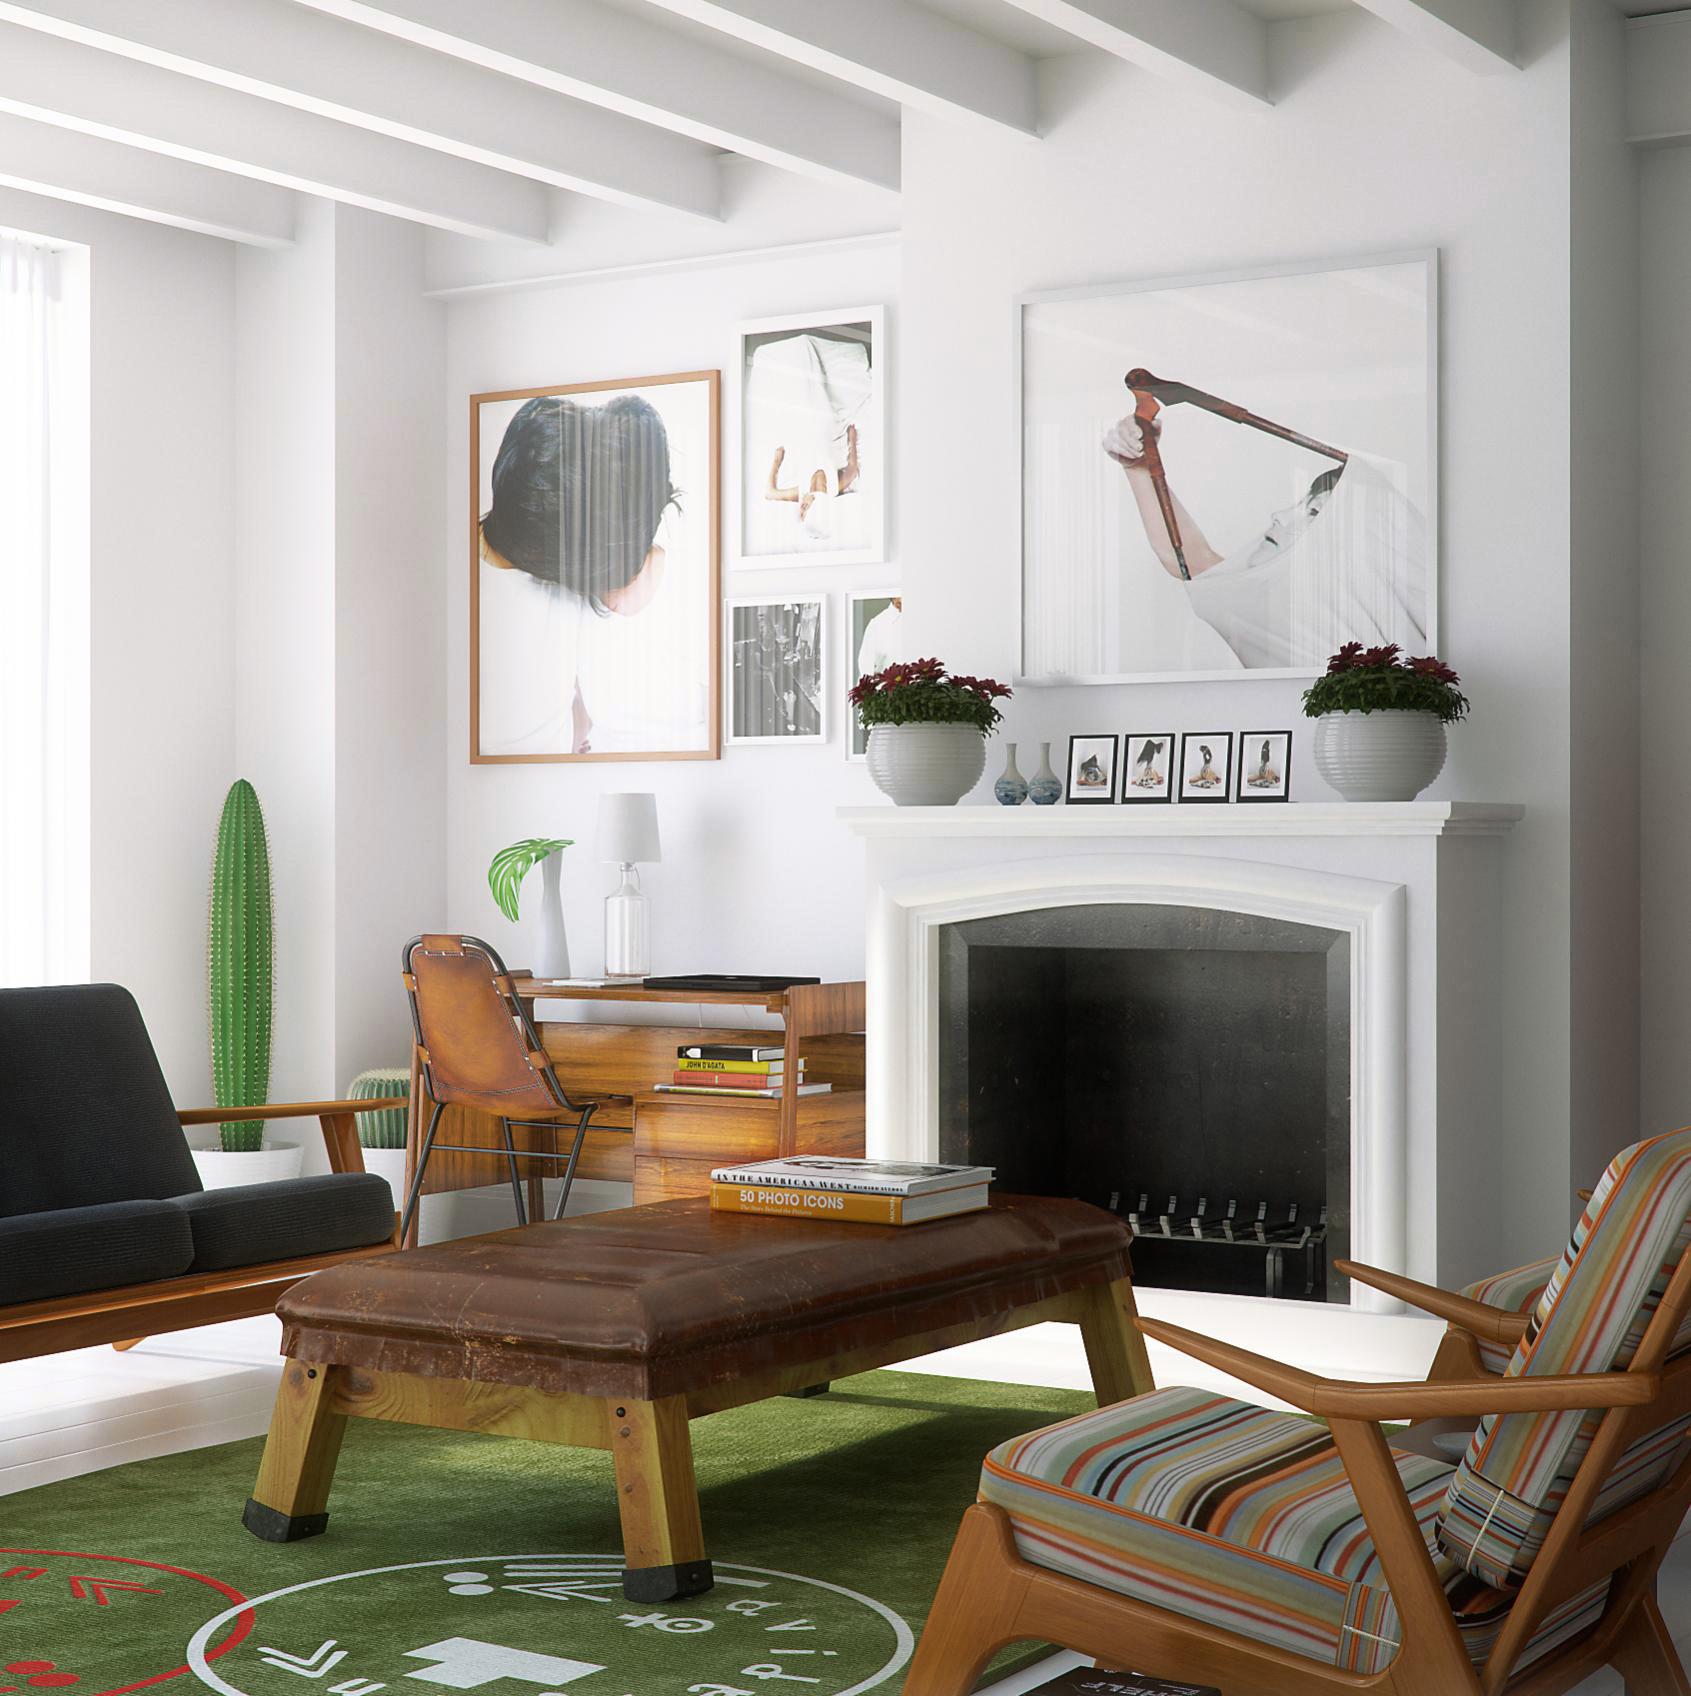 At Home Furnishings: Two Beautiful Urban Lofts Visualized